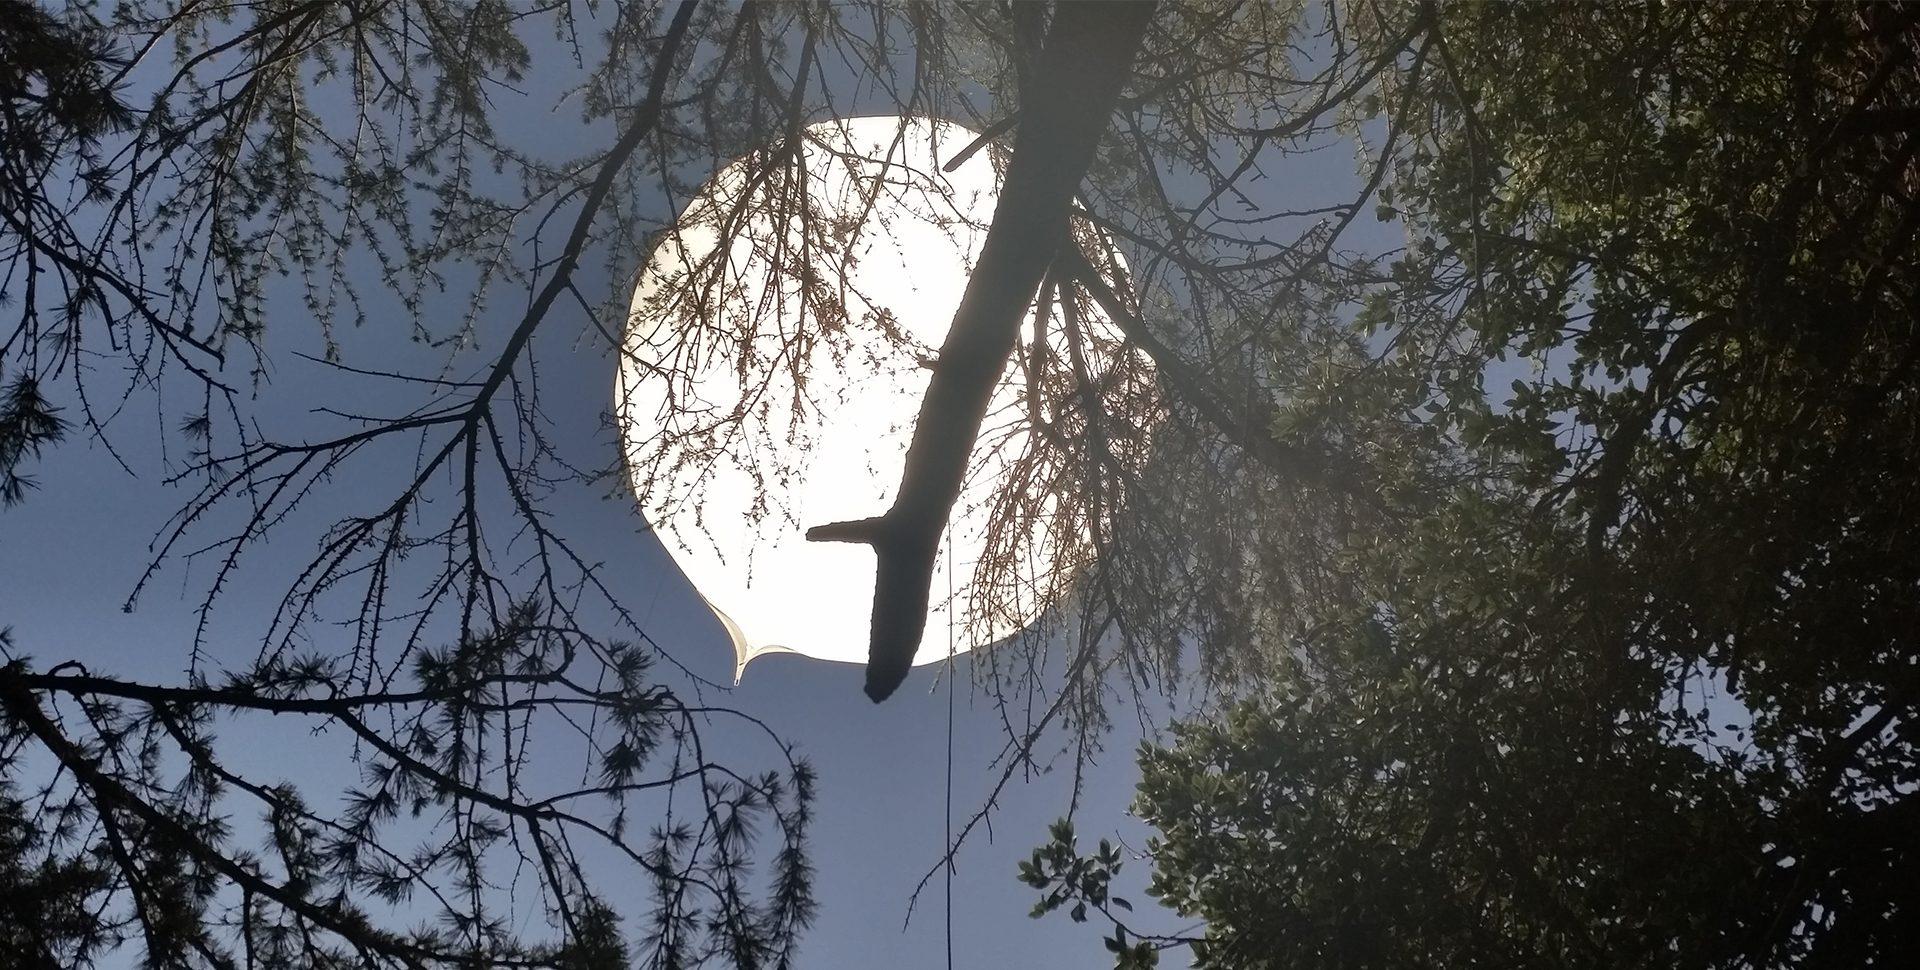 Sphere - Ellipse: HMI